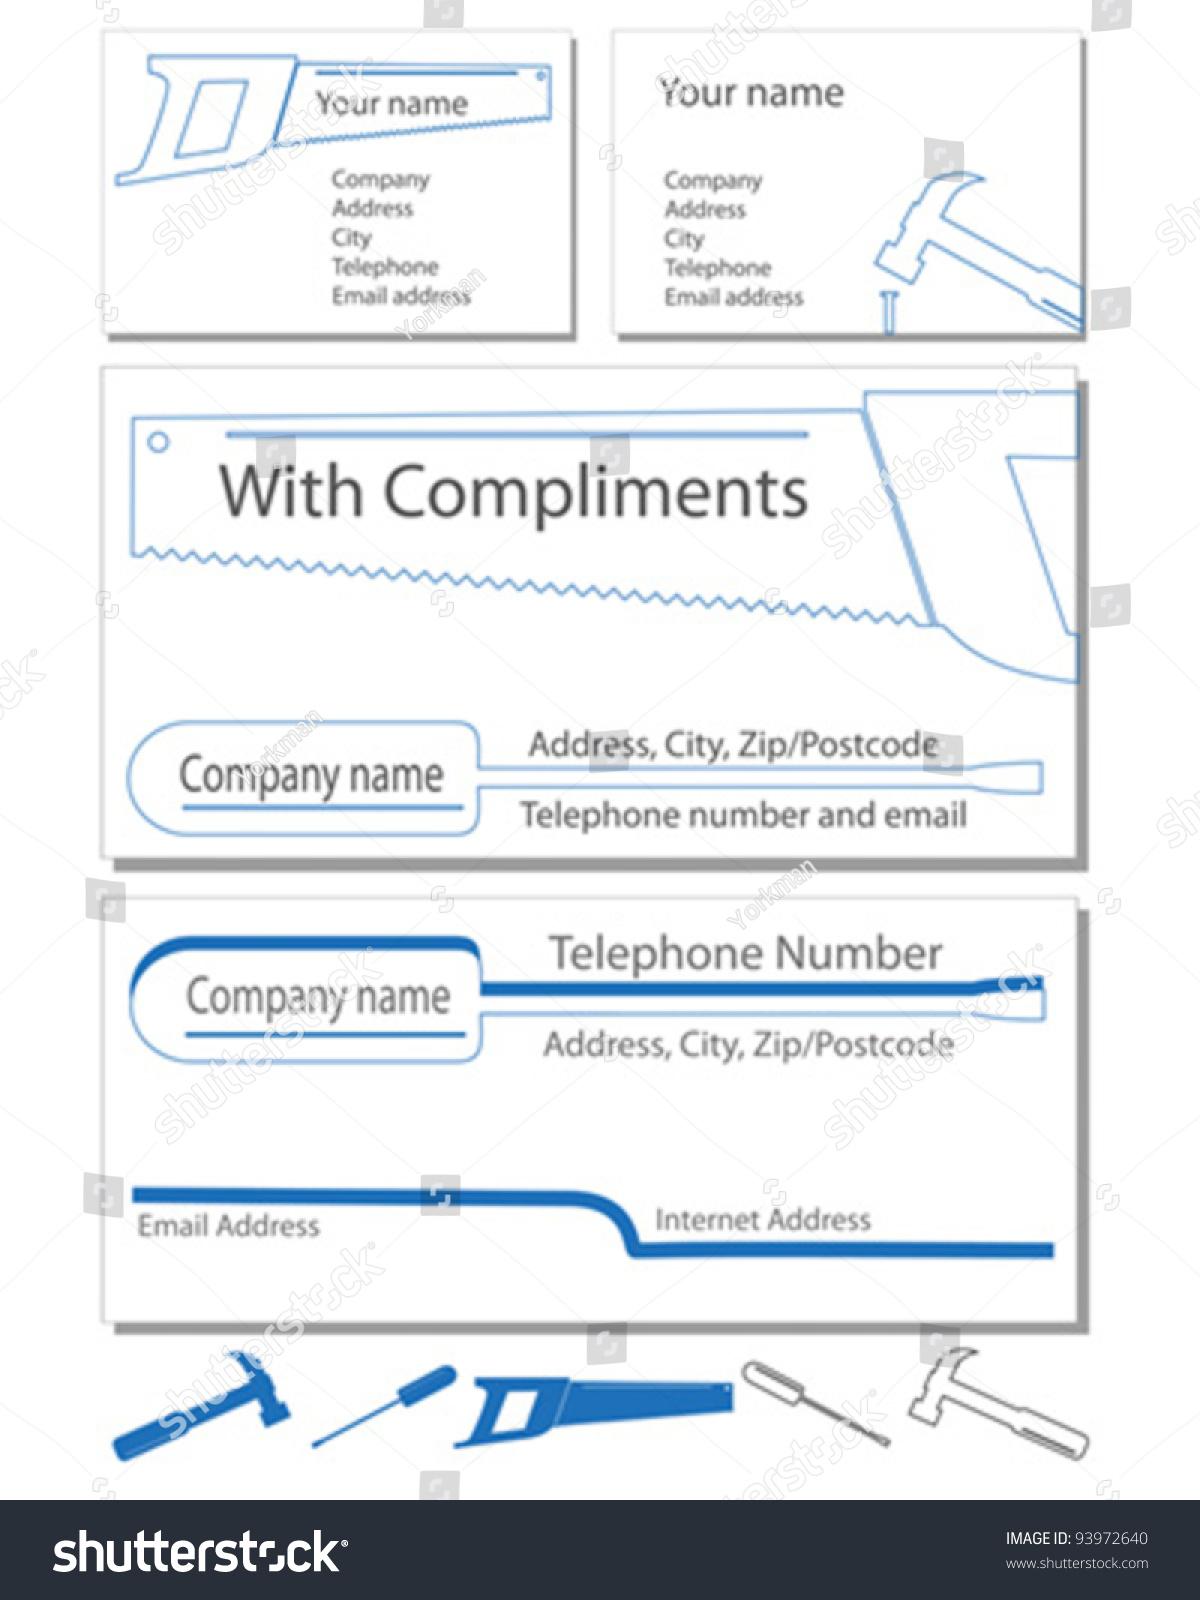 Unusual Business Card Address Format Ideas - Business Card Ideas ...